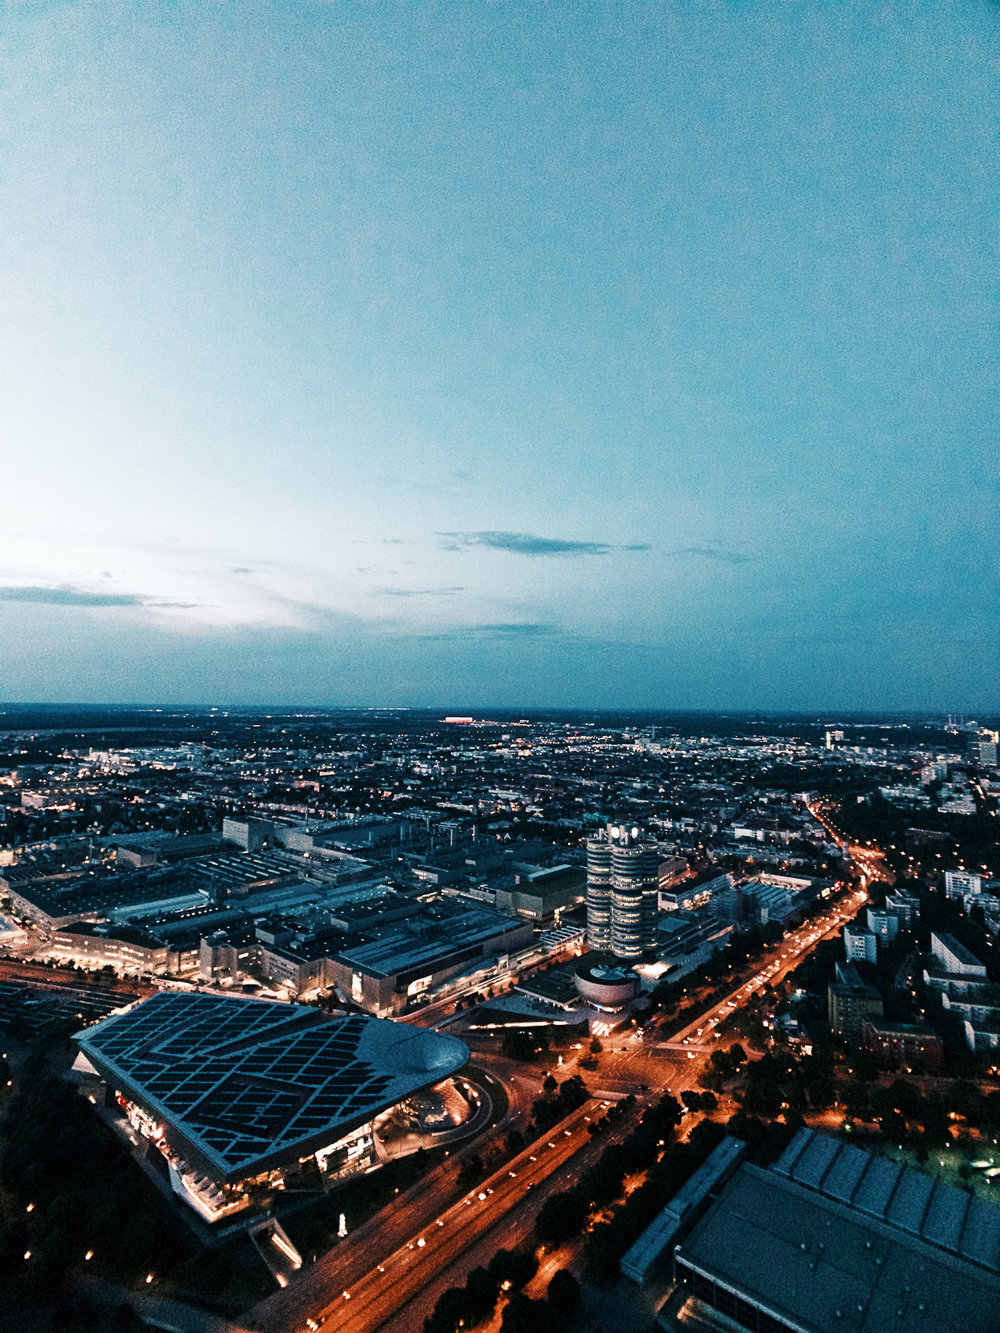 bitplay Olympiapark Tower   Y!PE 關於德國生活與旅遊的社群媒體-11.jpg